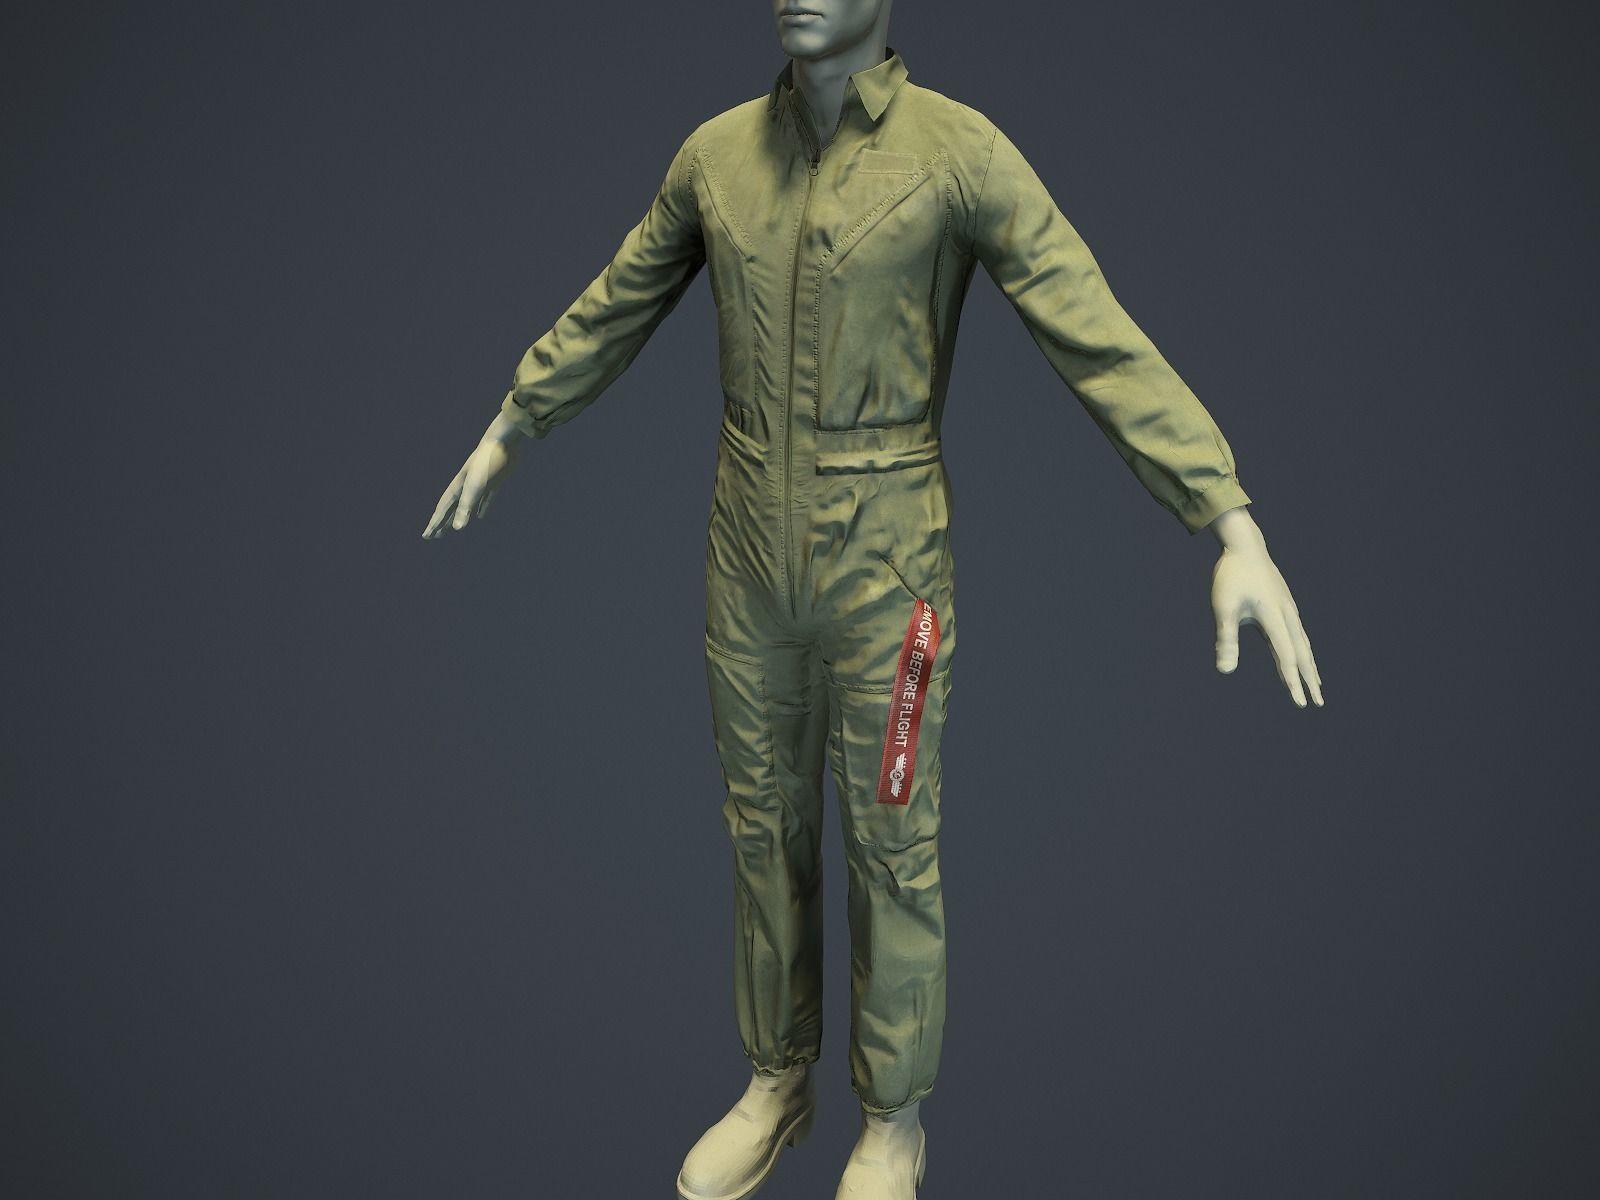 Mechanic Uniform for Games